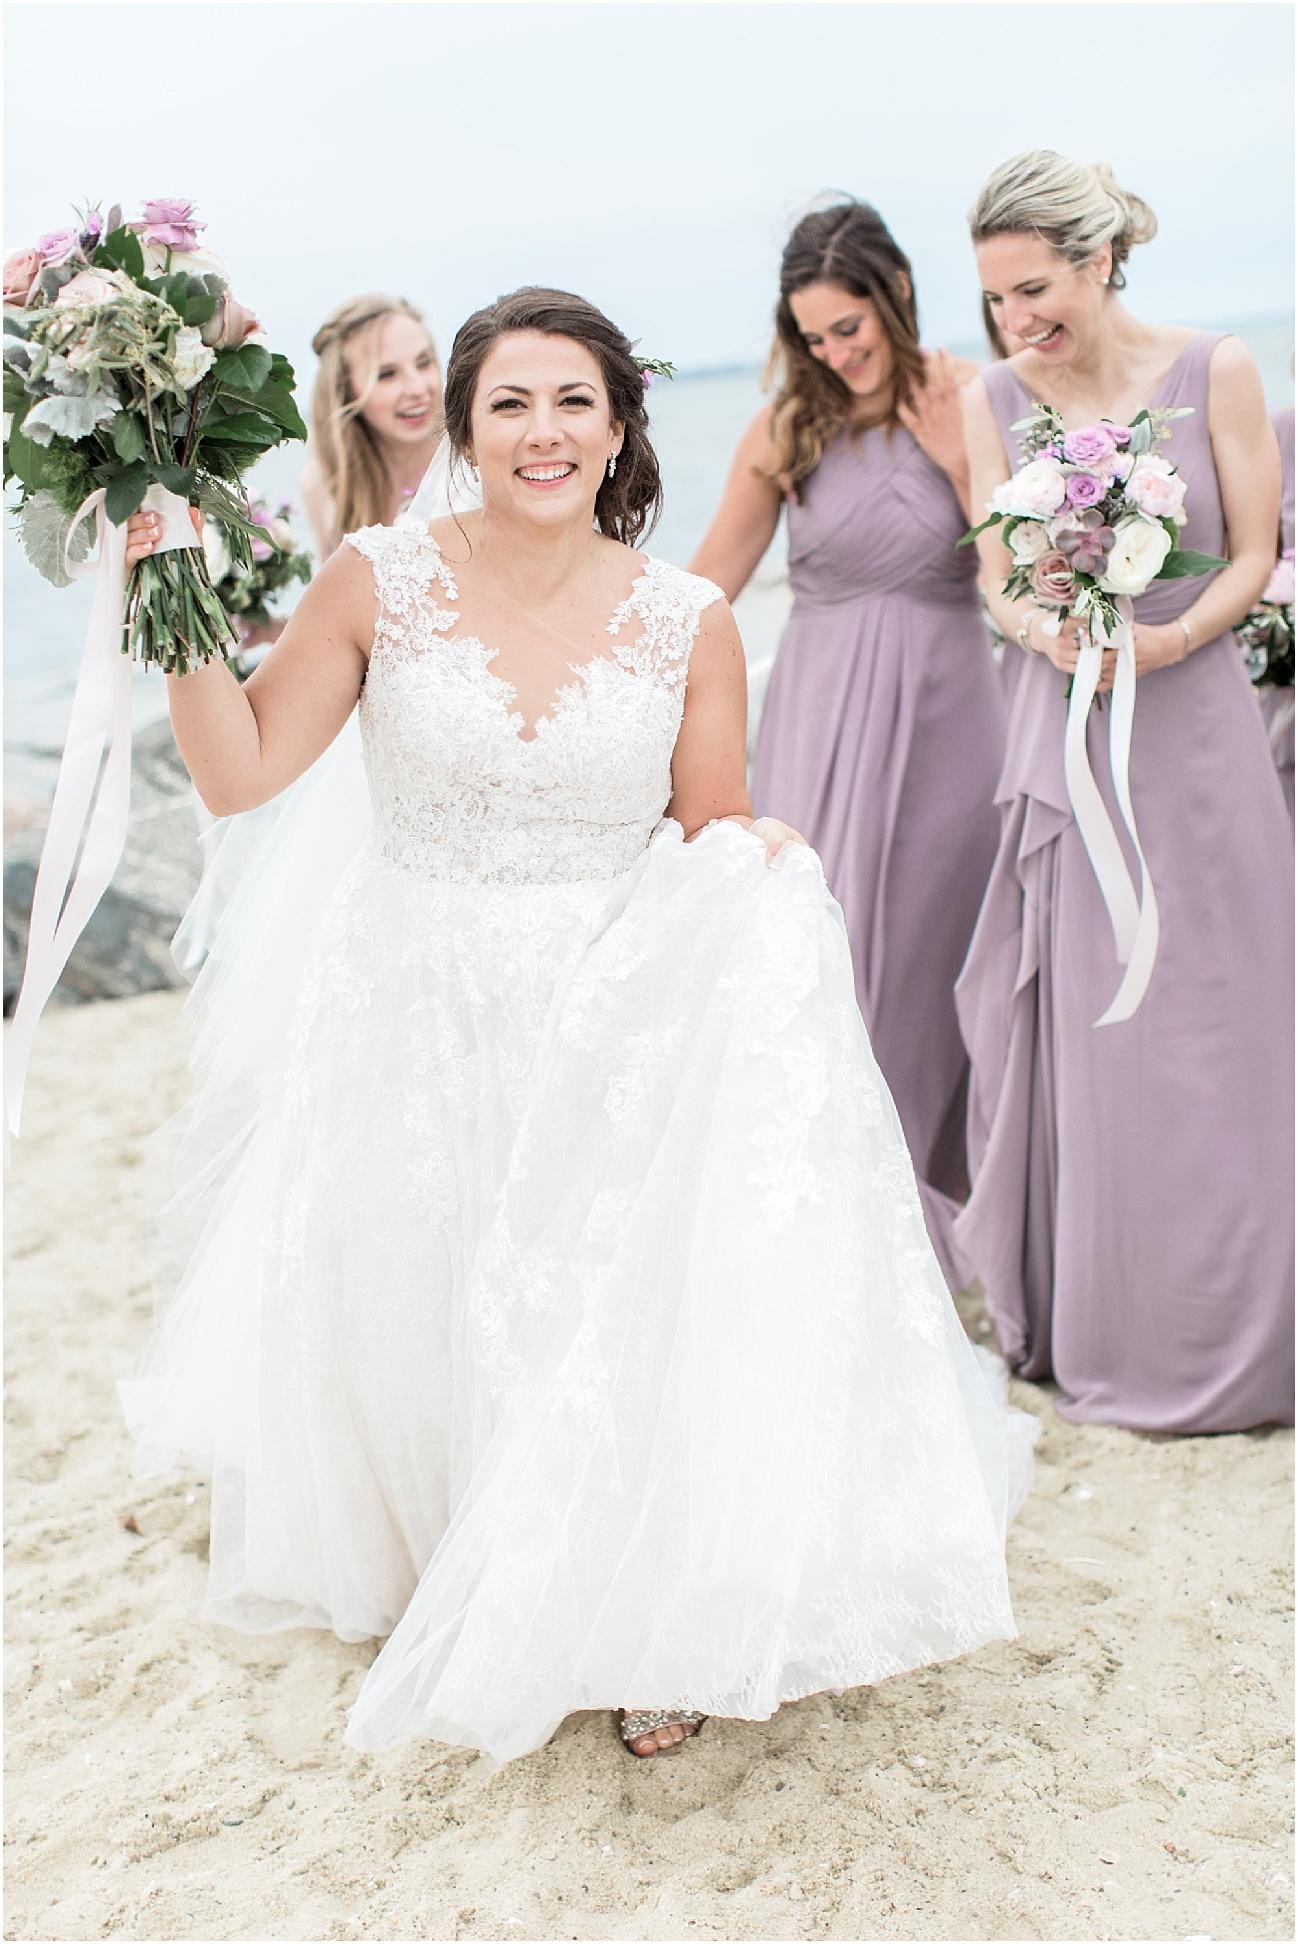 courtney_kurt_cape_cod_popponessett_inn_dowses_beach_boston_wedding_meredith_jane_photography_photo_0041.jpg